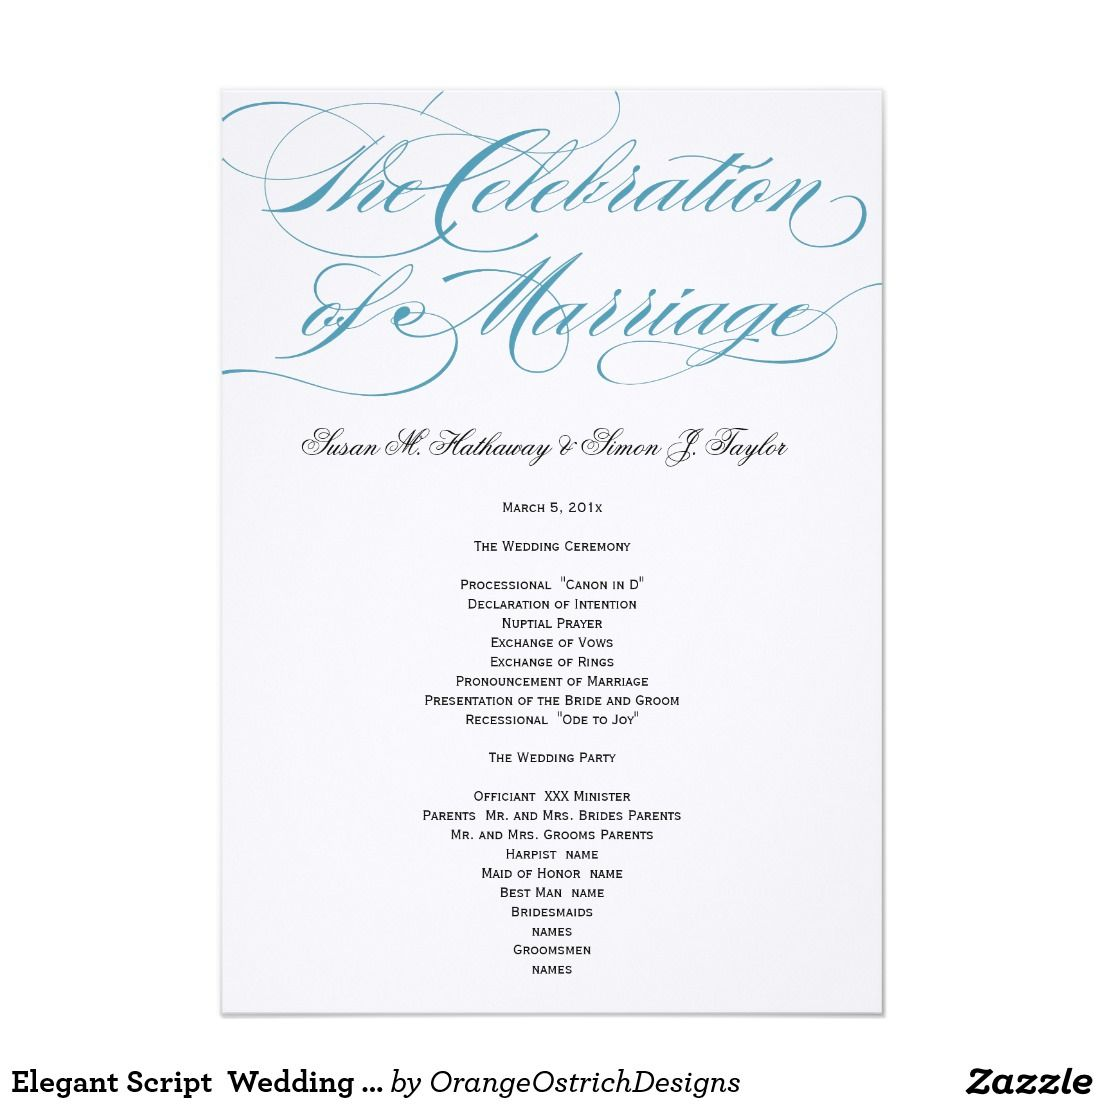 invitation programs software